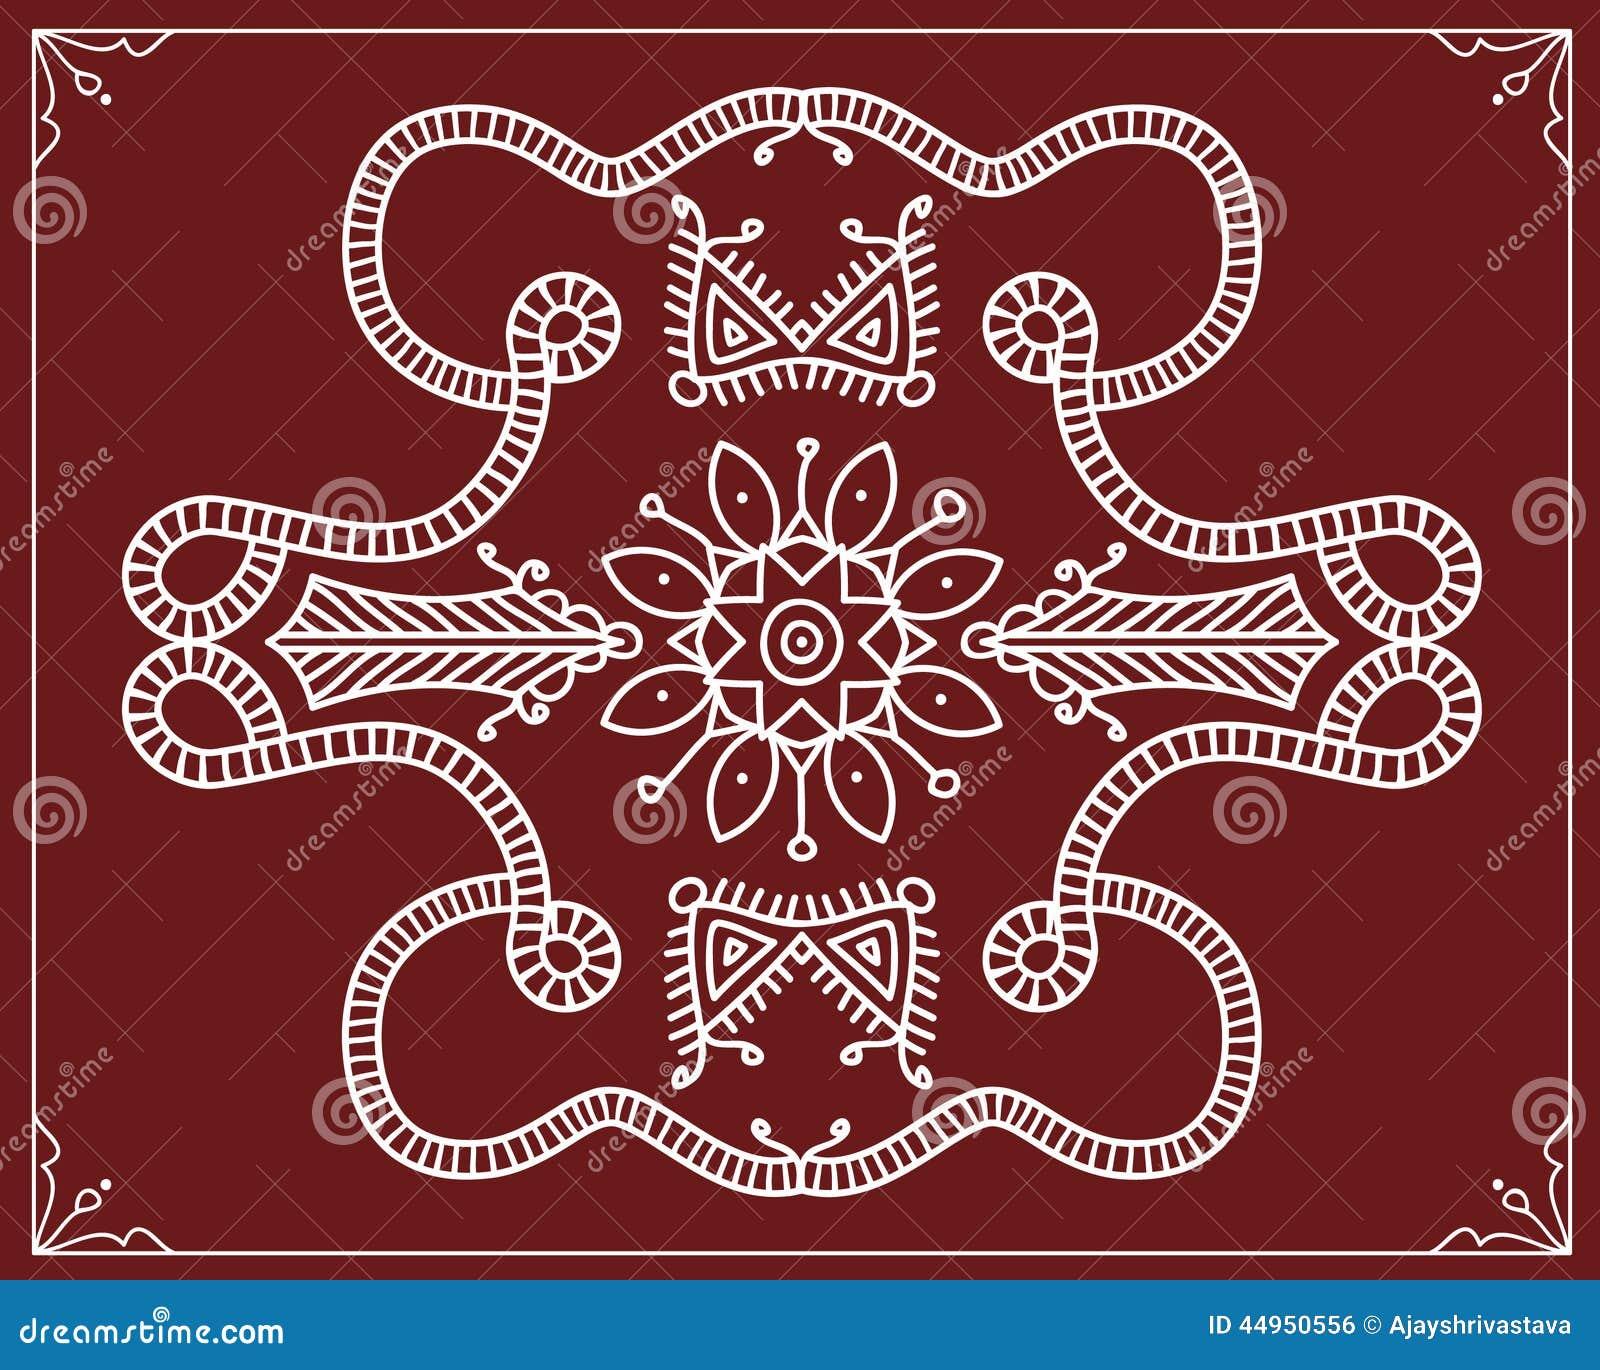 folk tribal design motif wall painting stock vector image 44950556. Black Bedroom Furniture Sets. Home Design Ideas